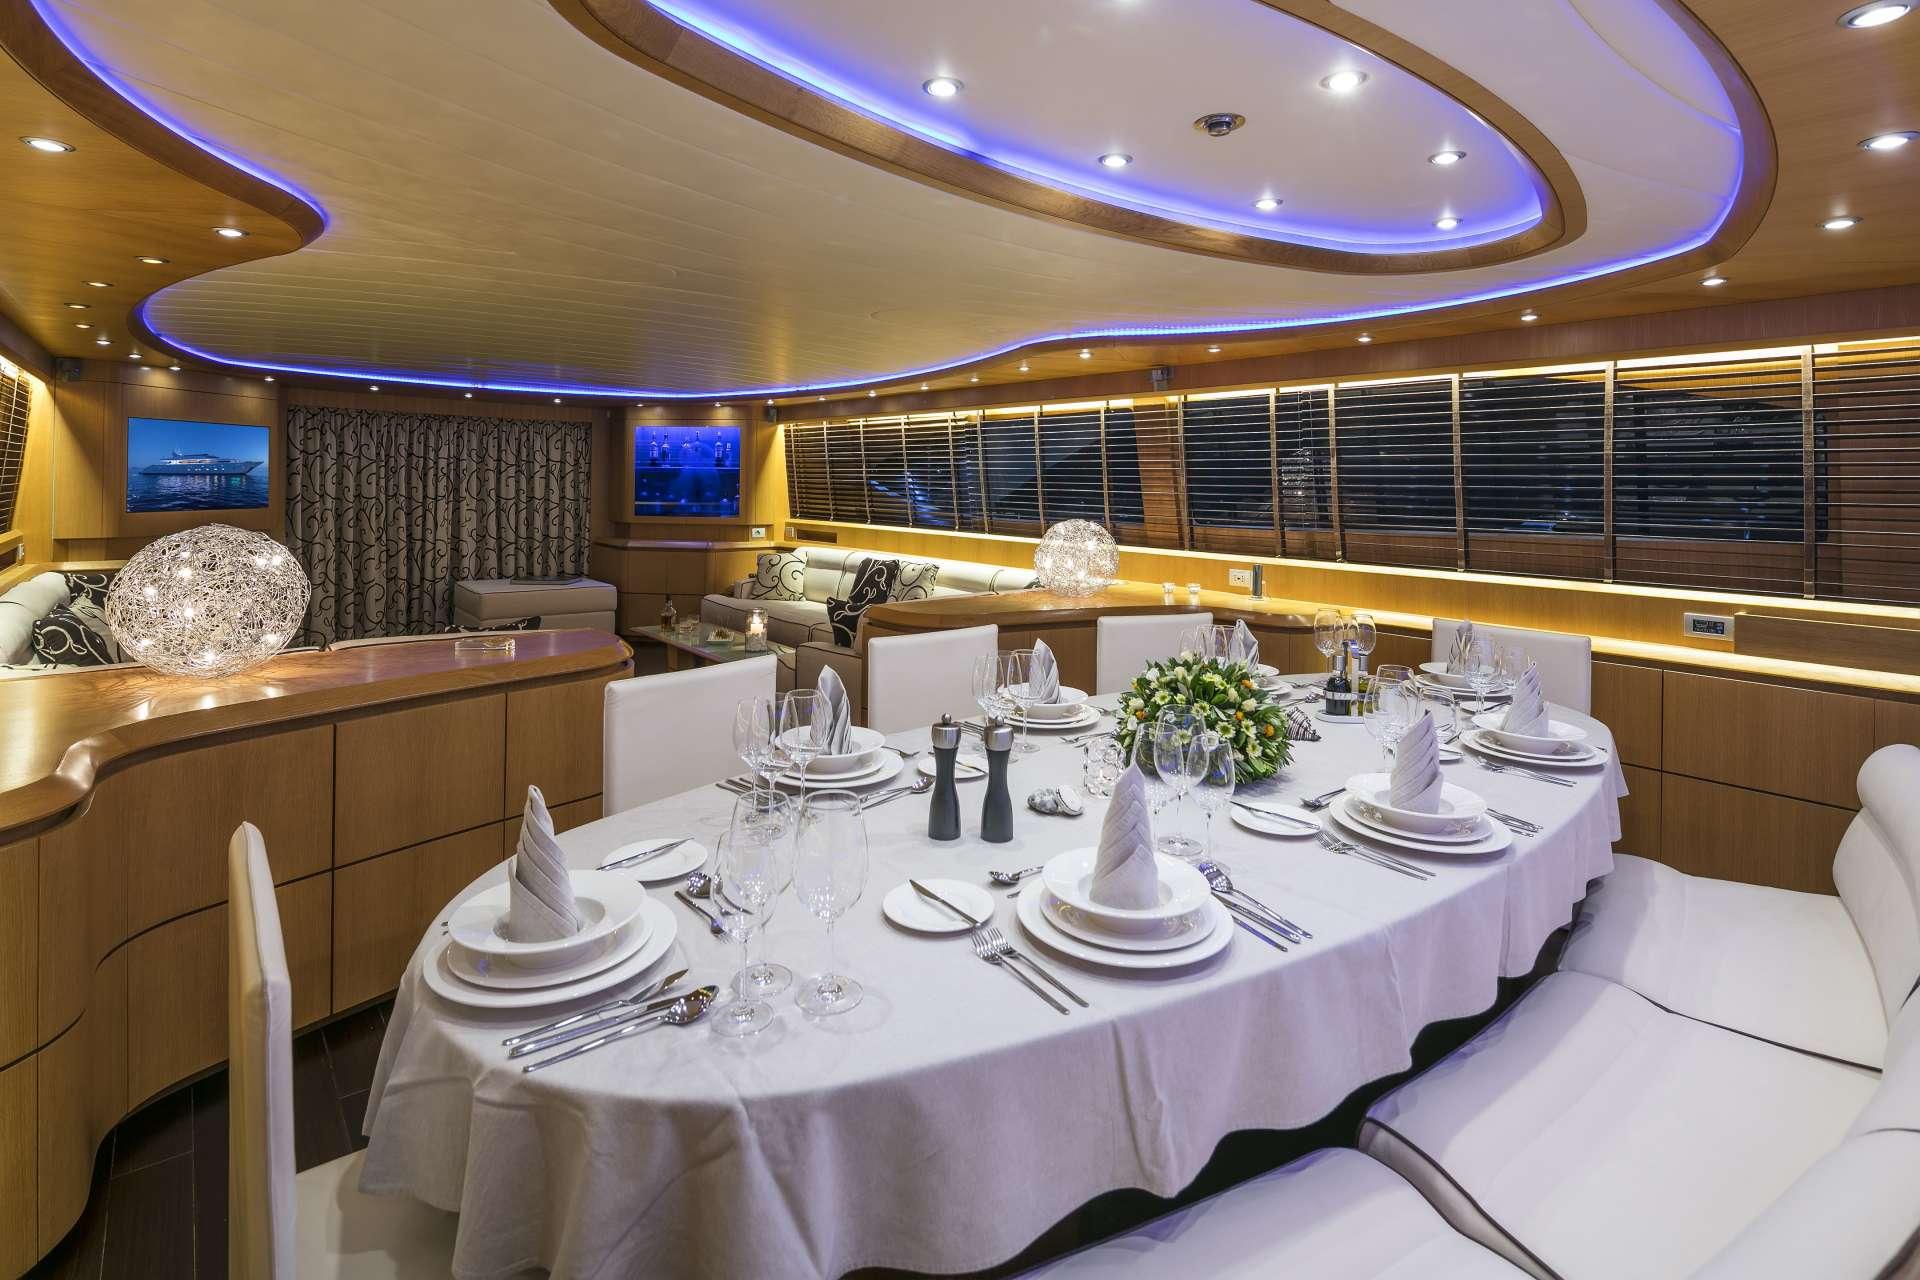 Motor Yacht 'PARIS A' Dining area, 12 PAX, 6 Crew, 115.00 Ft, 35.06 Meters, Built 2009, Majora, Refit Year 2013